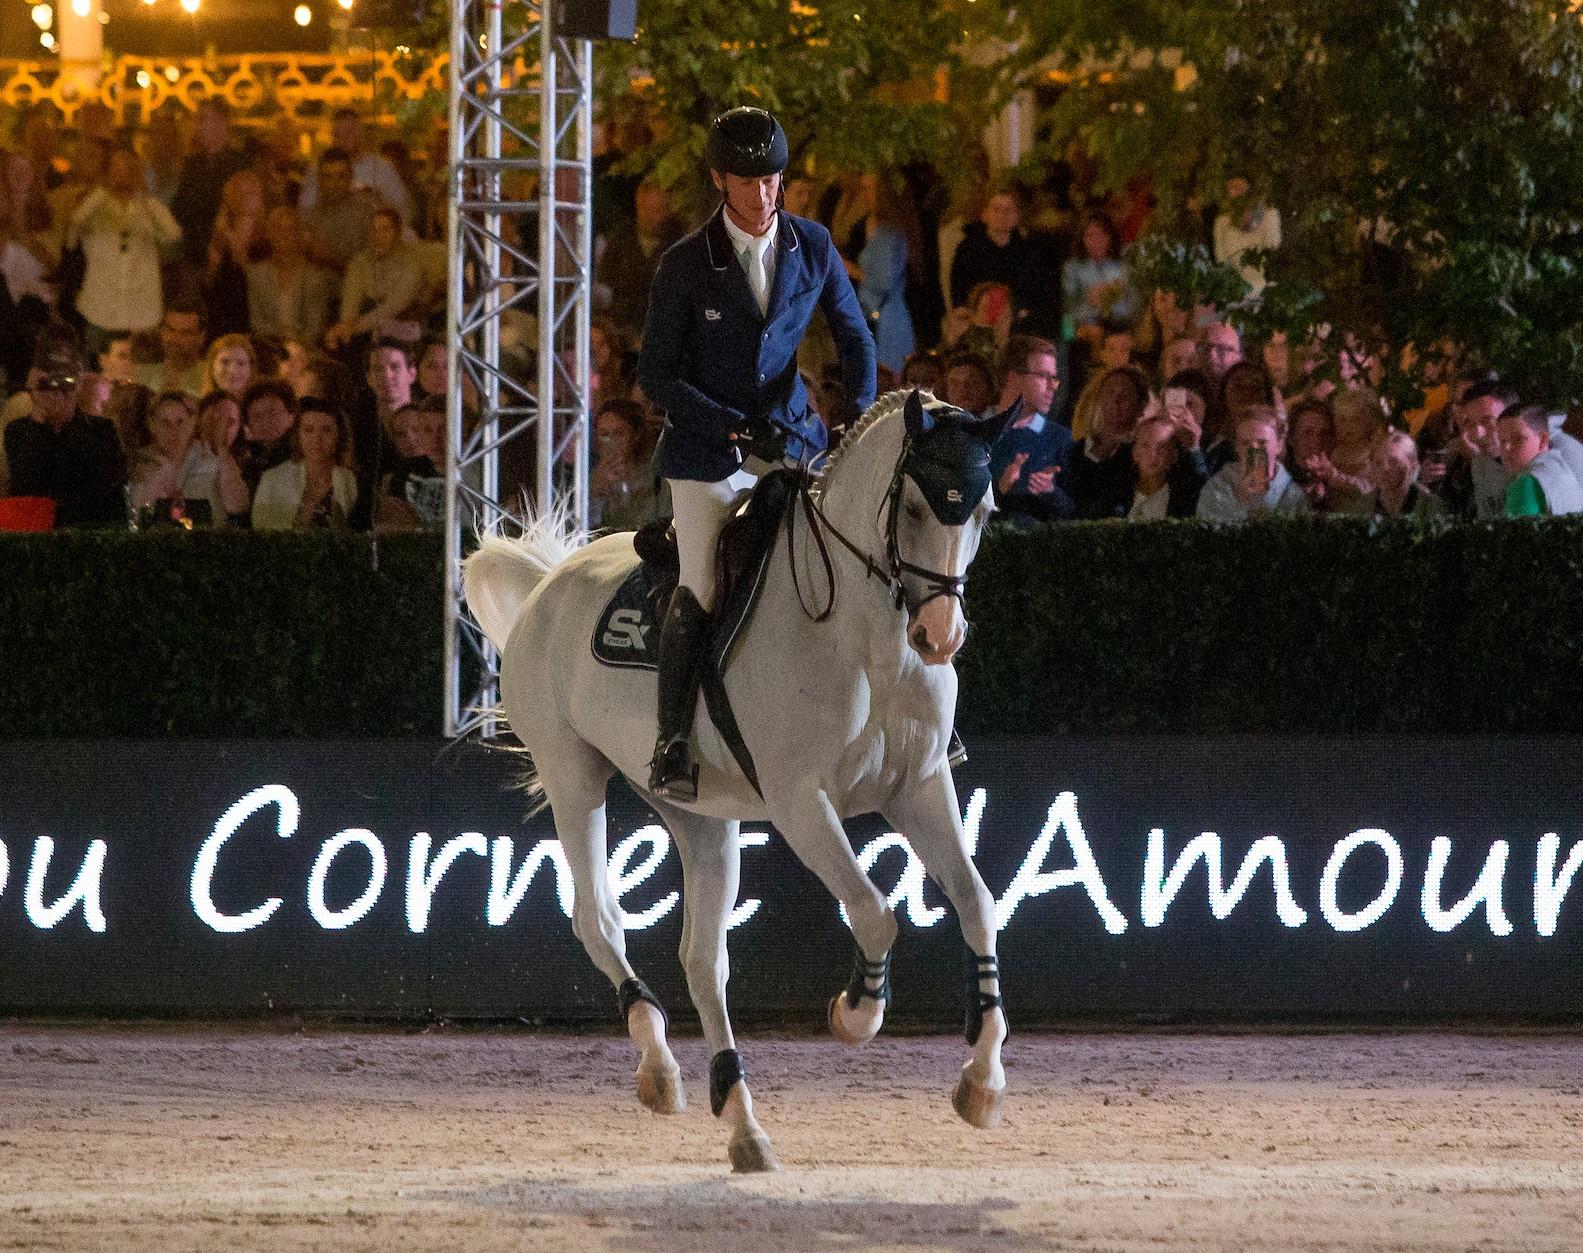 Brüssel: Cornet d'Amour feierlich verabschiedet